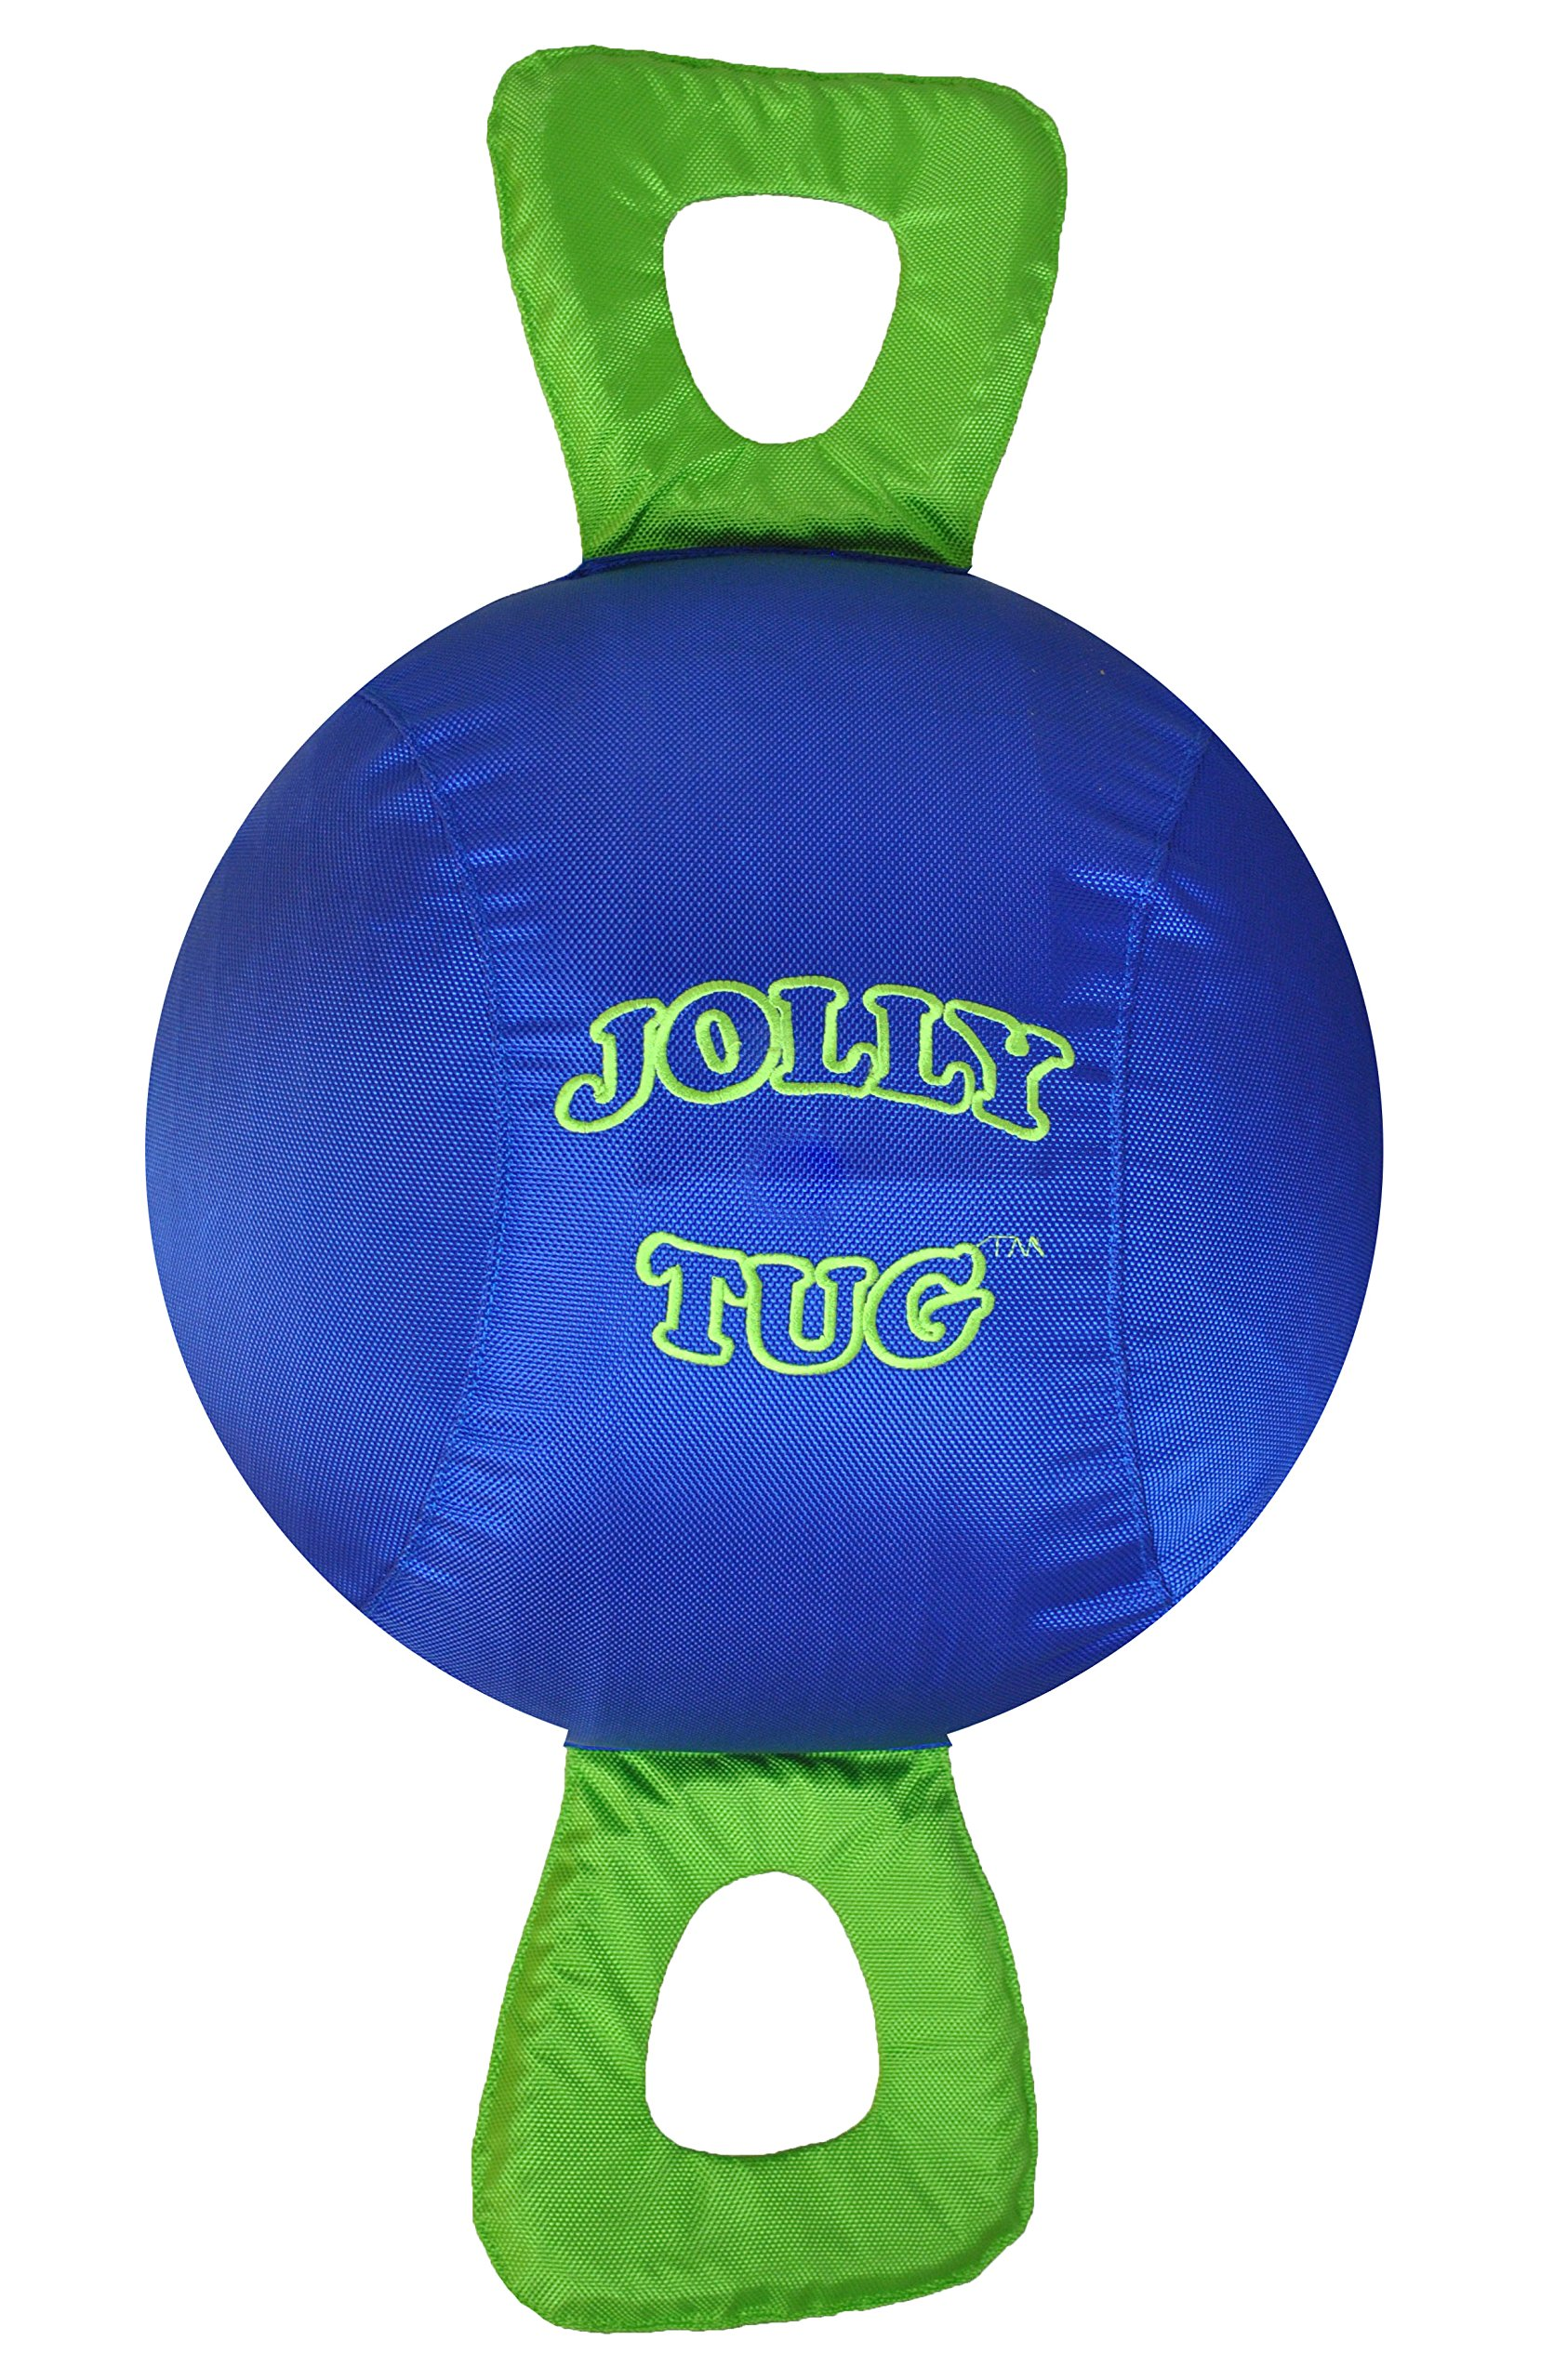 Horsemen's Pride 14-Inch Horse Jolly Tug, Blue